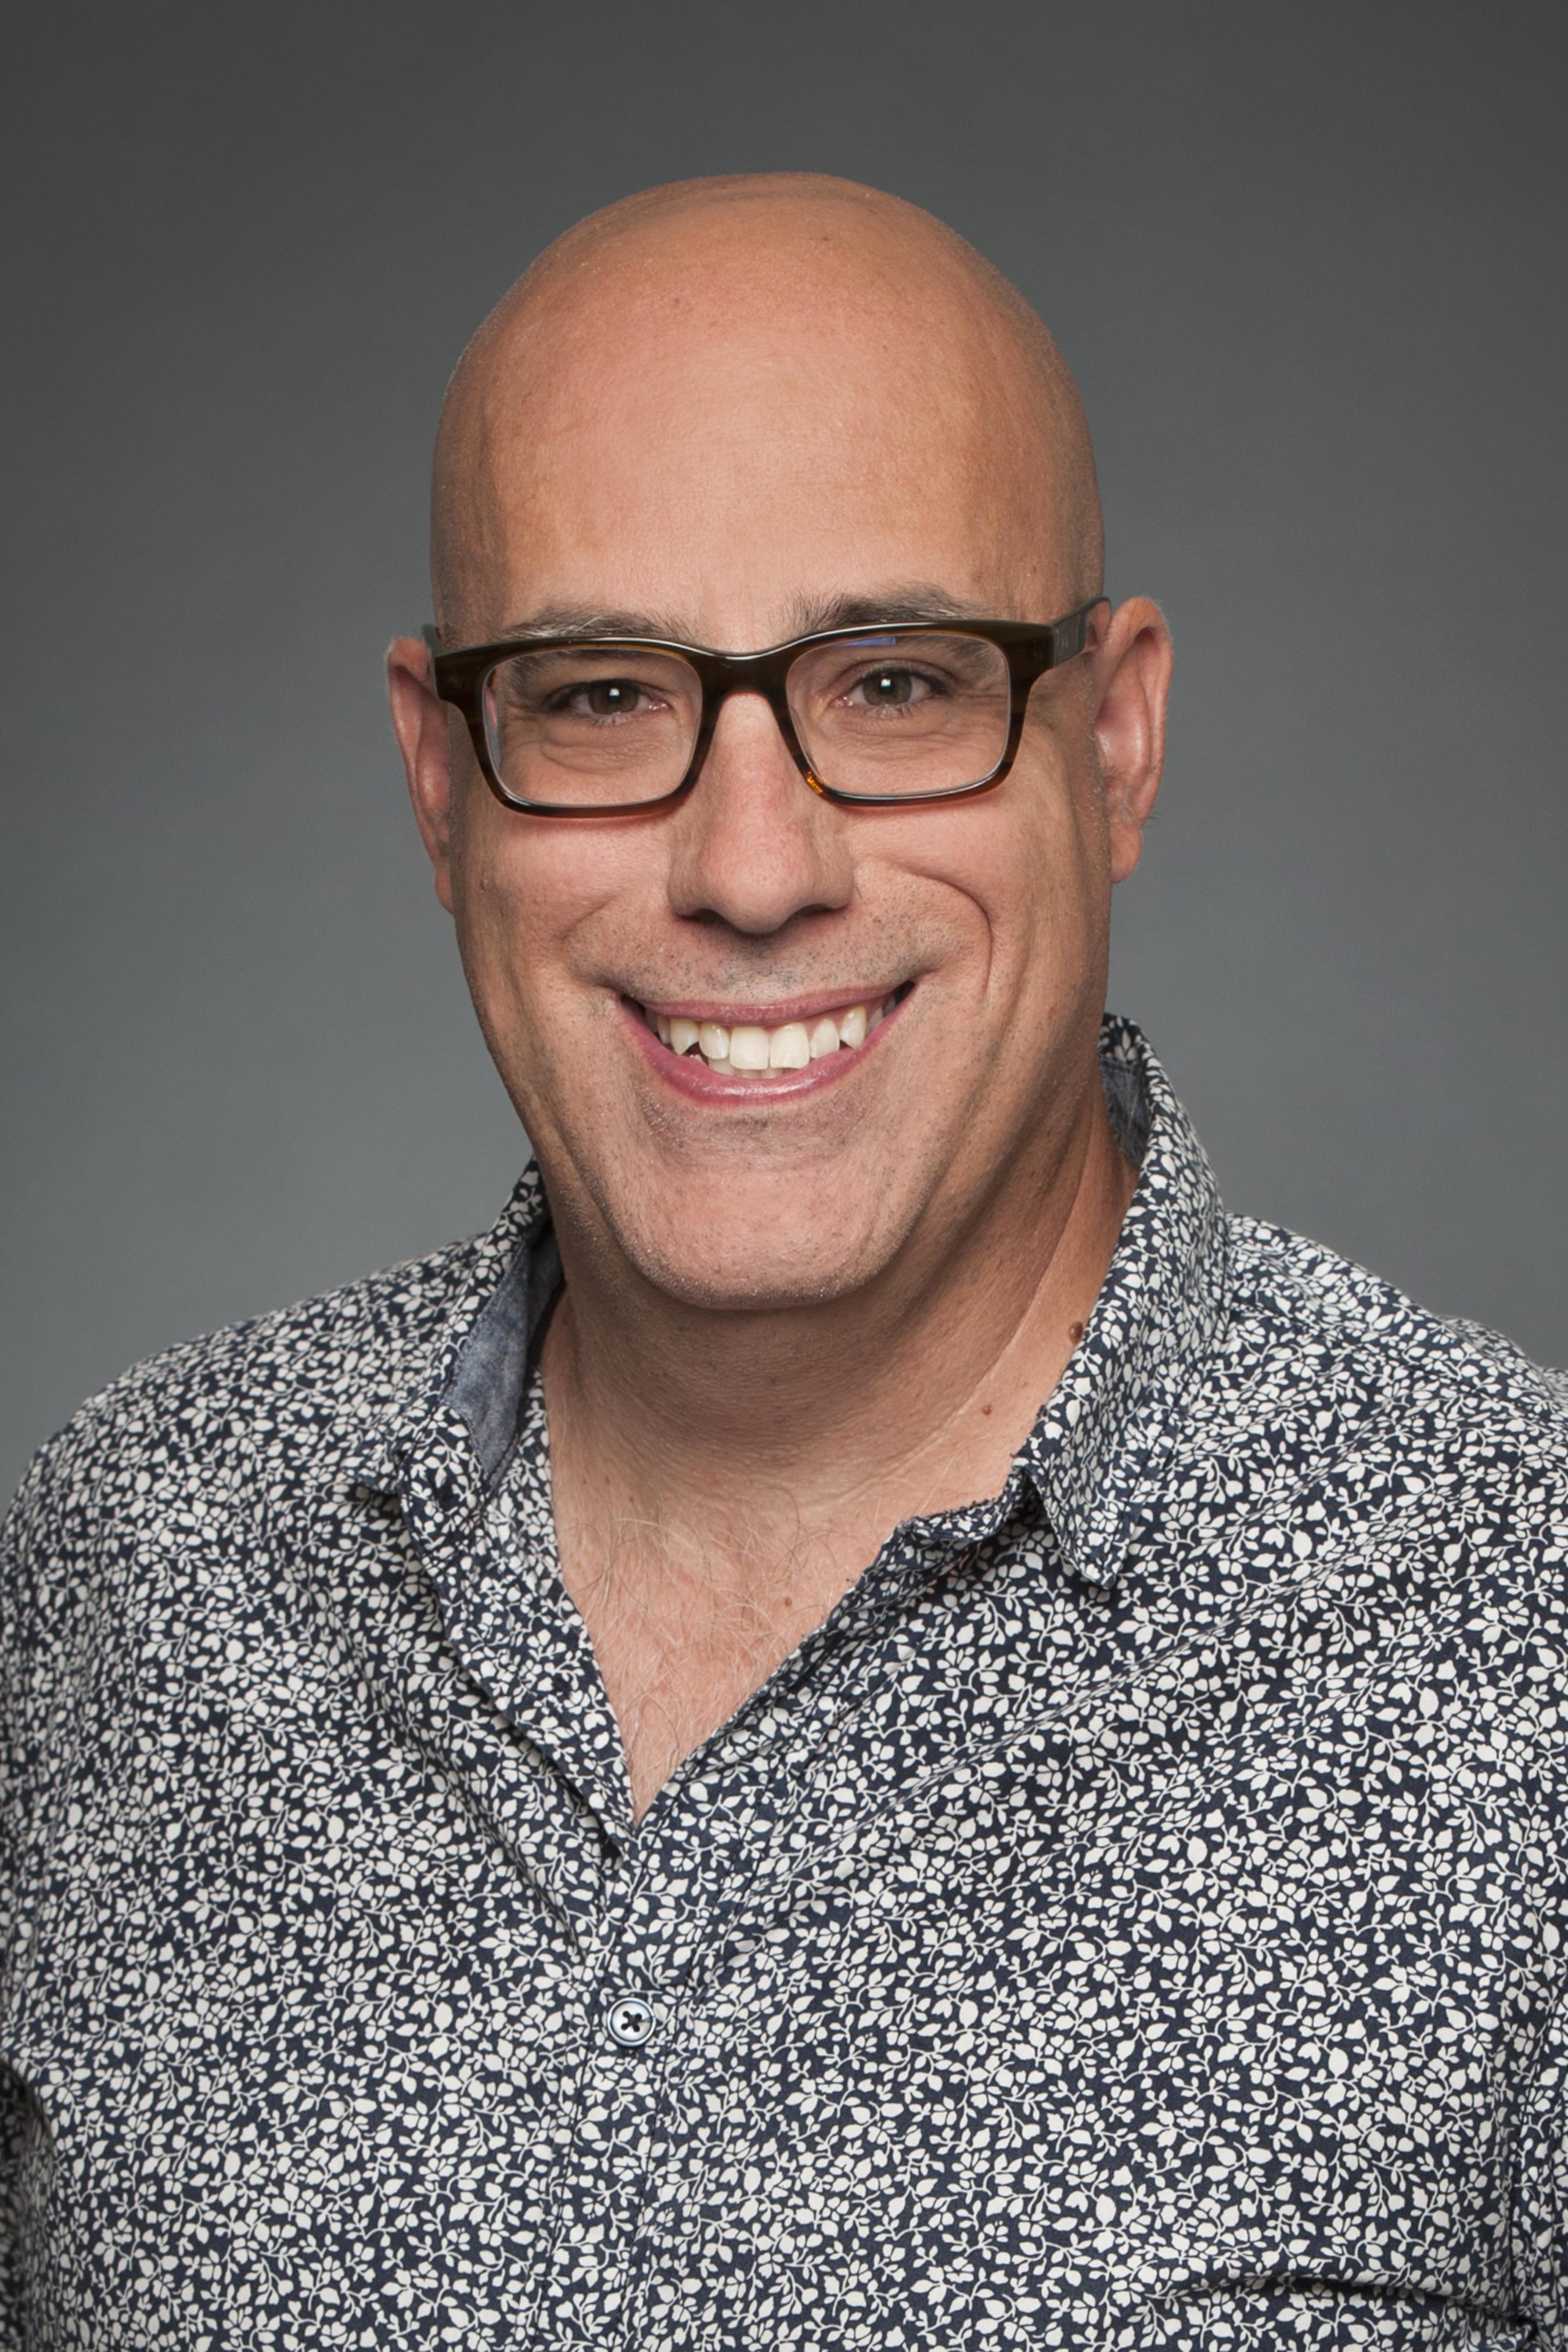 Eric Dionne